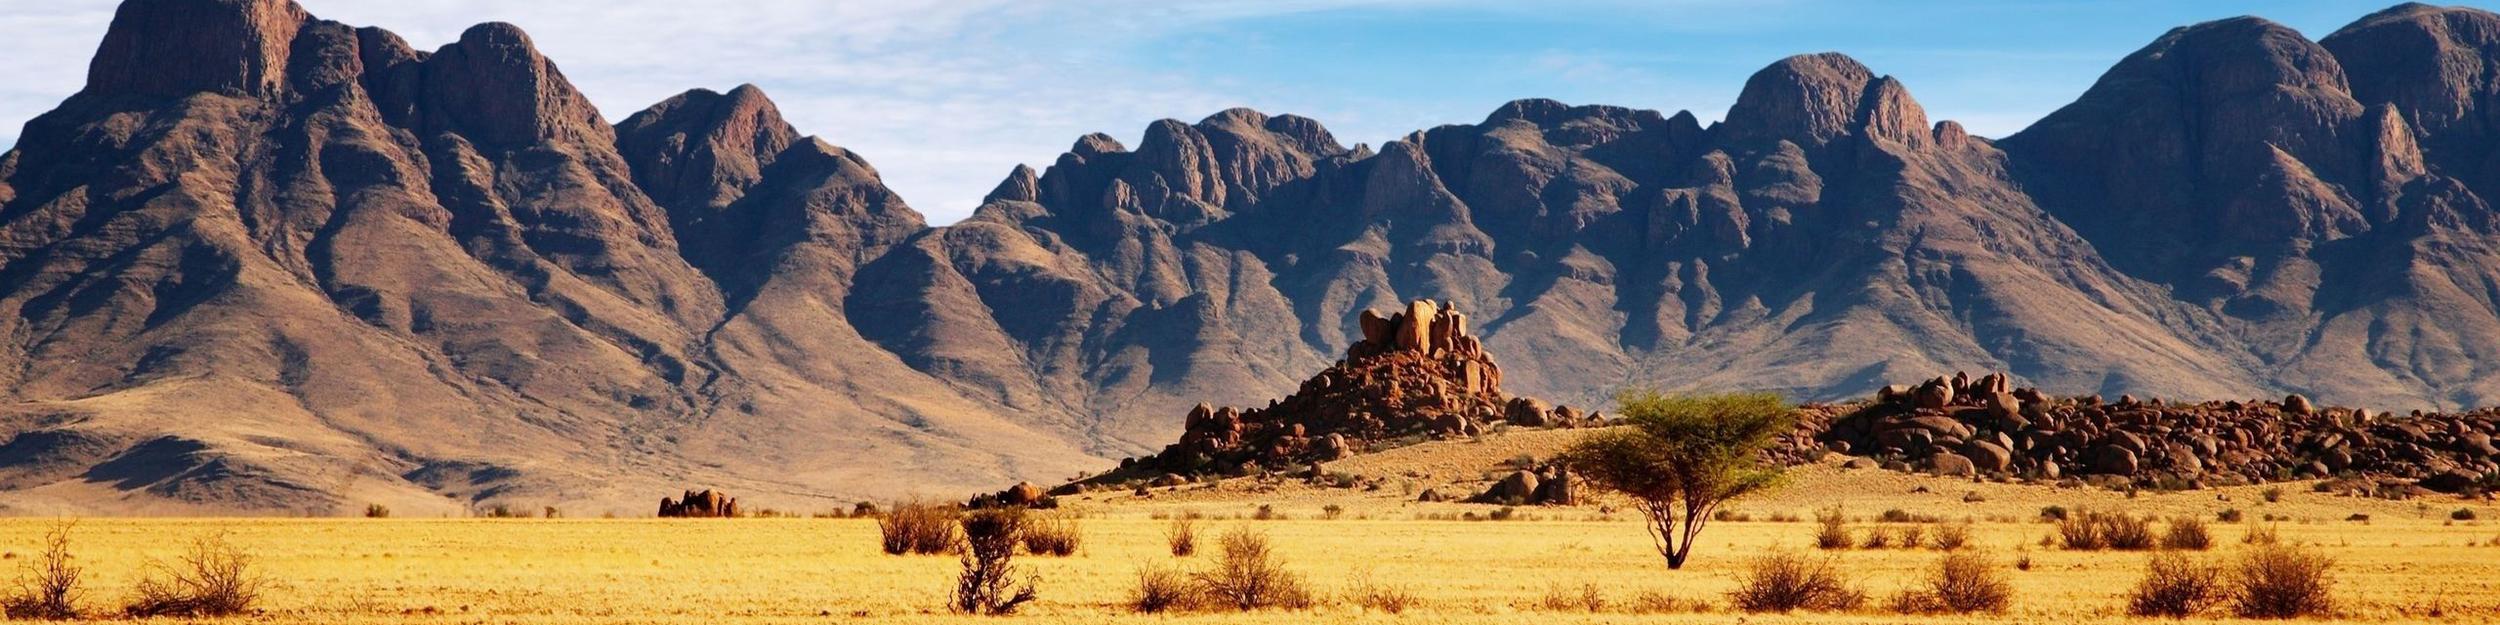 Desert-Beautiful-Landscape (1)